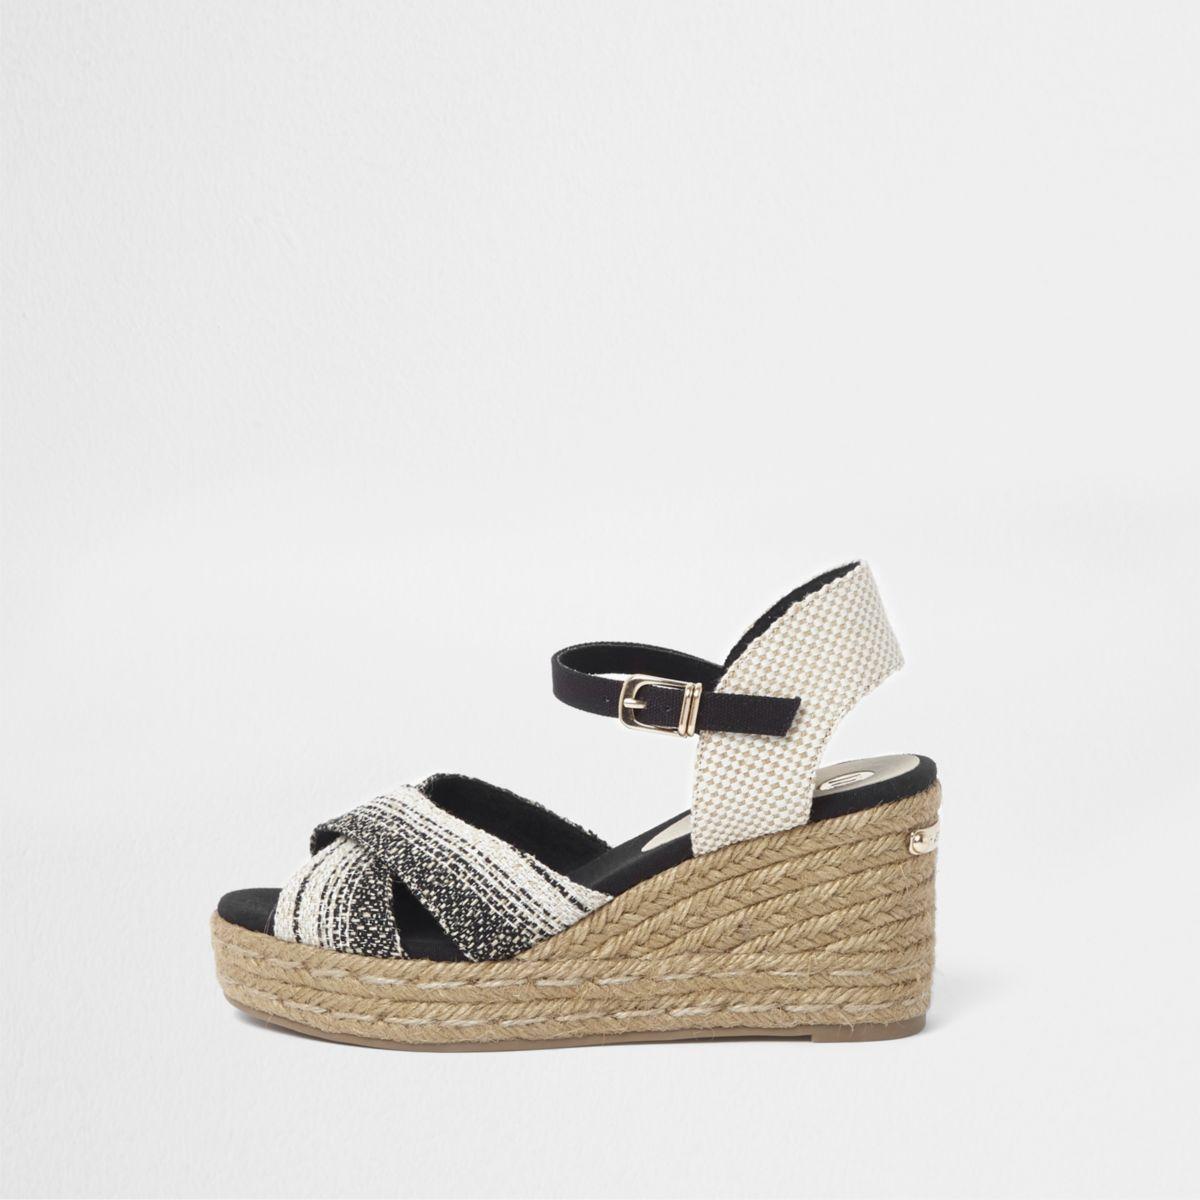 Cream cross strap espadrille wedge sandals